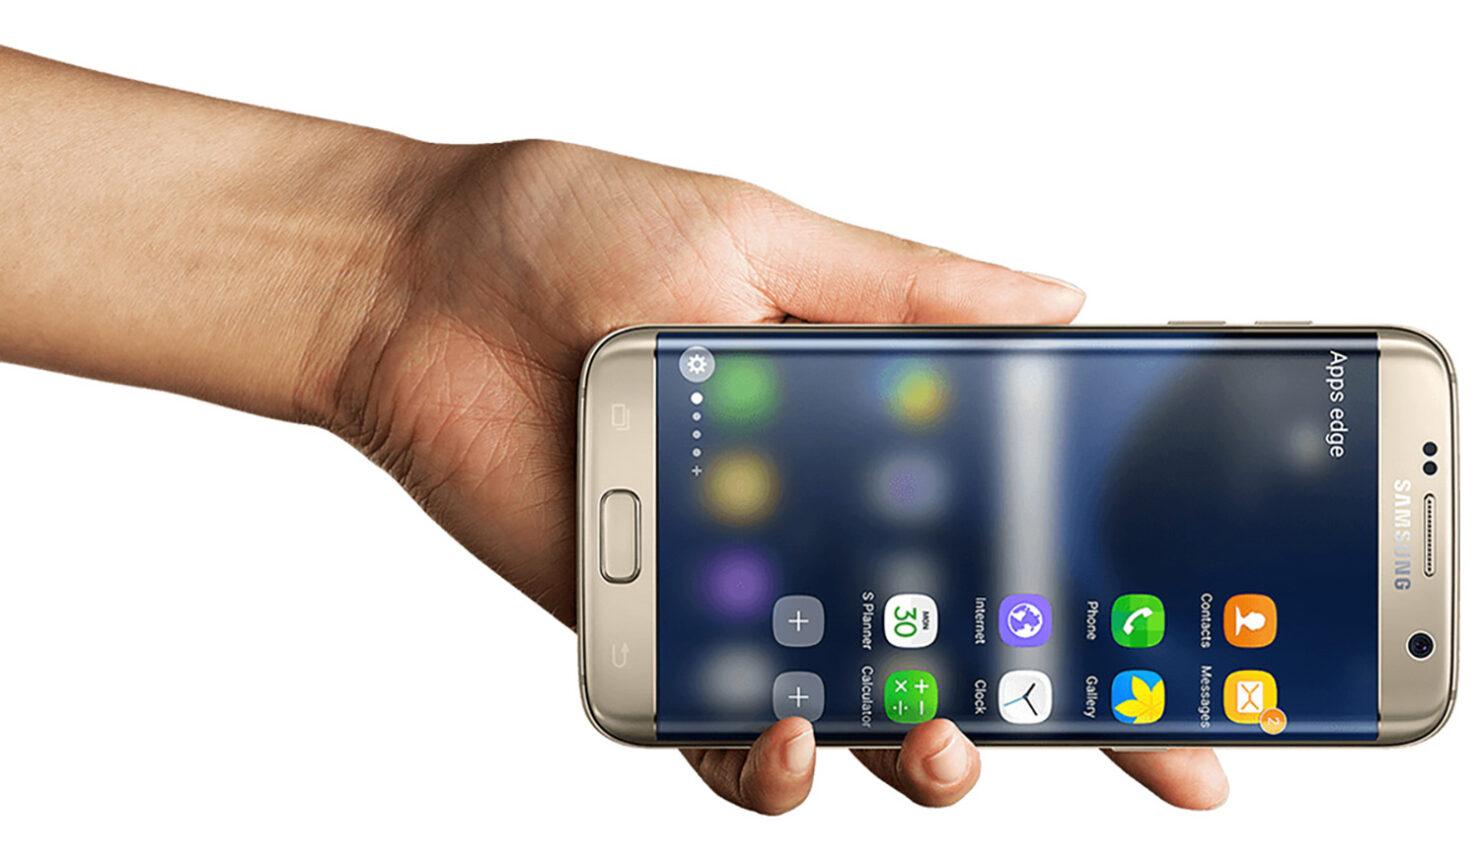 Galaxy S7 edge explodes unplugged